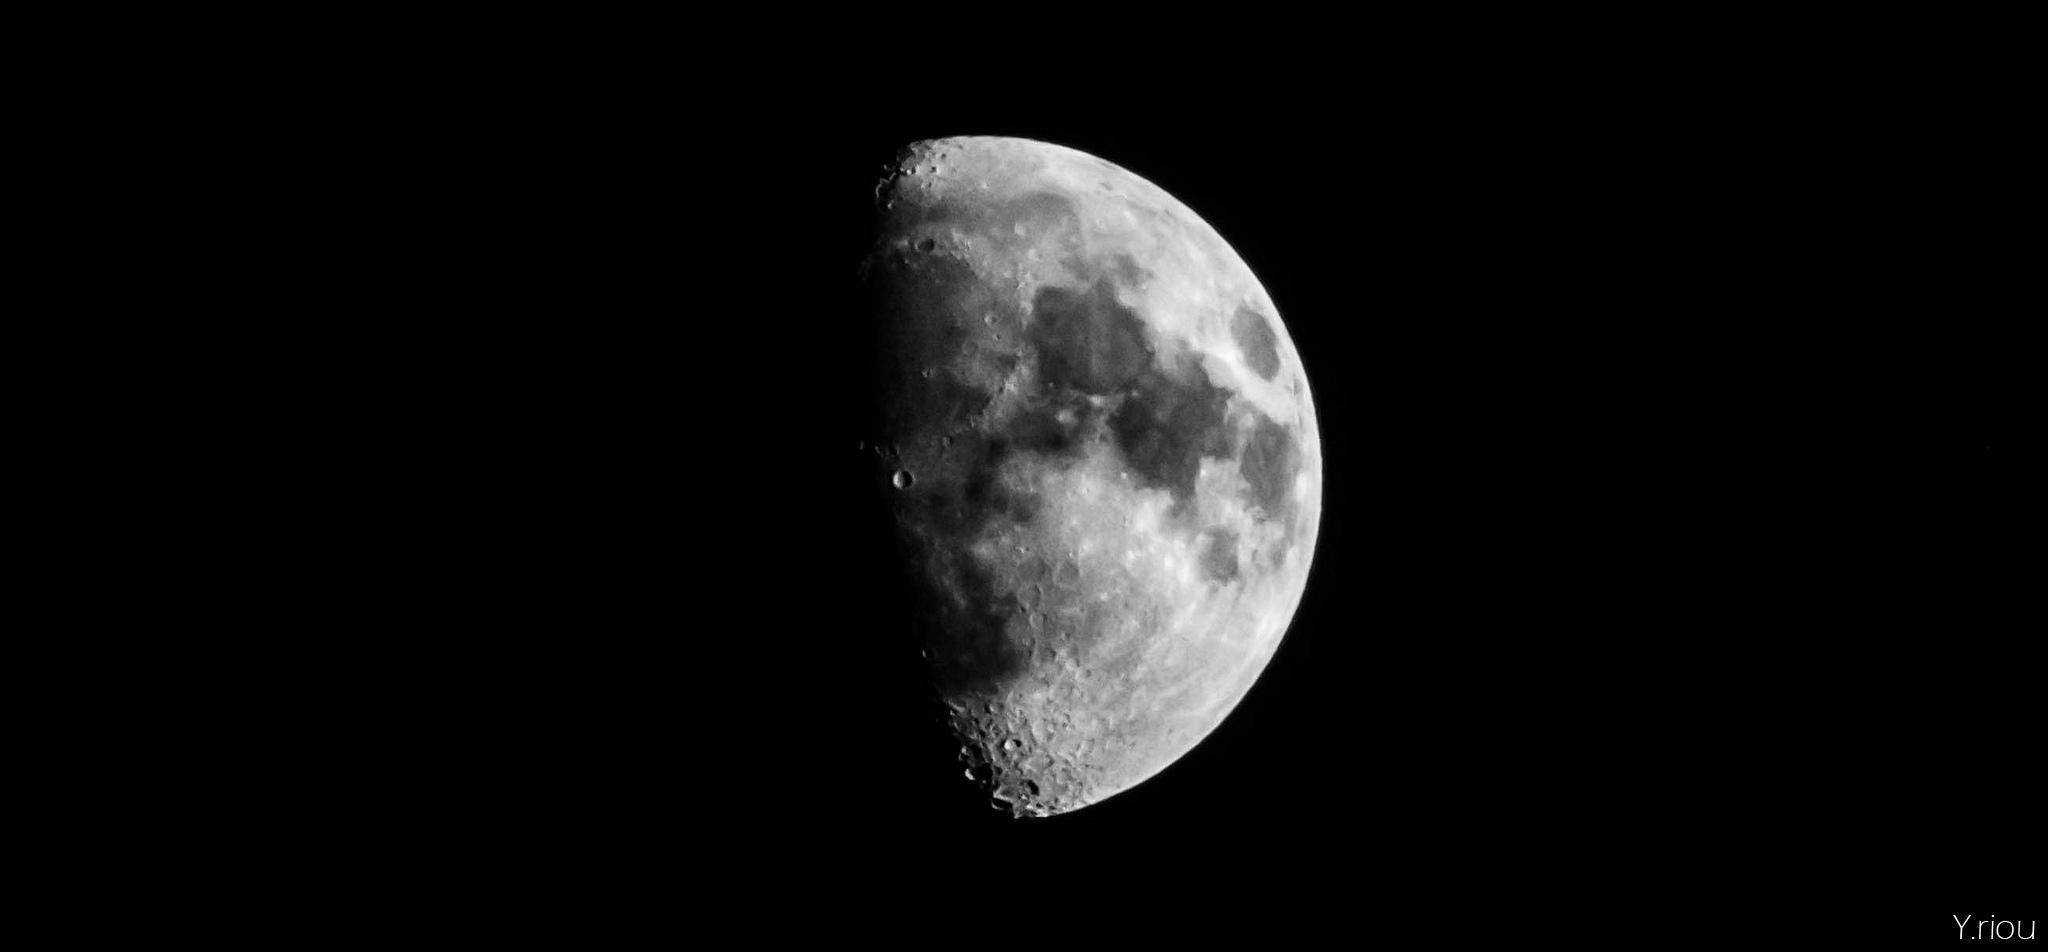 Black And White Moon 36 Background - Hdblackwallpaper.com